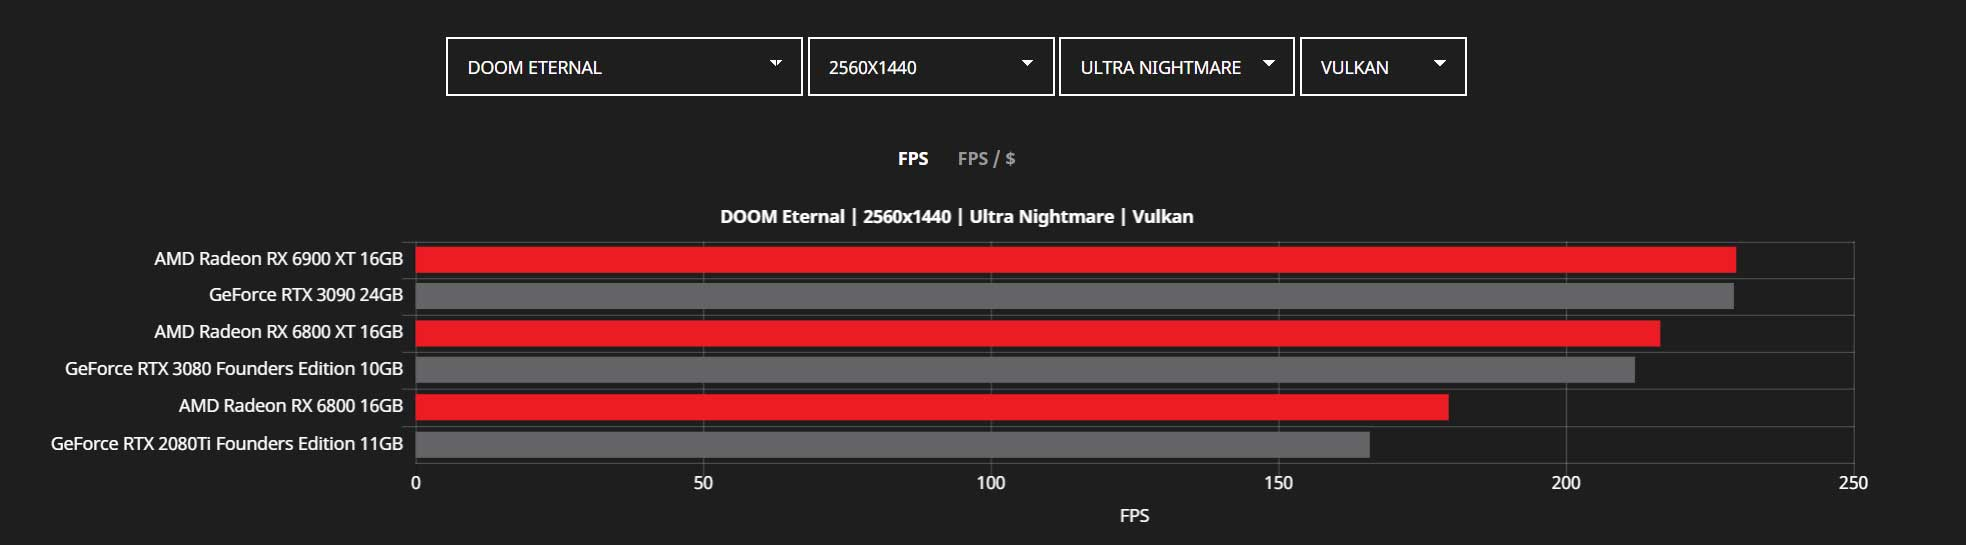 Radeon RX 6000 series Vs GeForce RTX 30 series